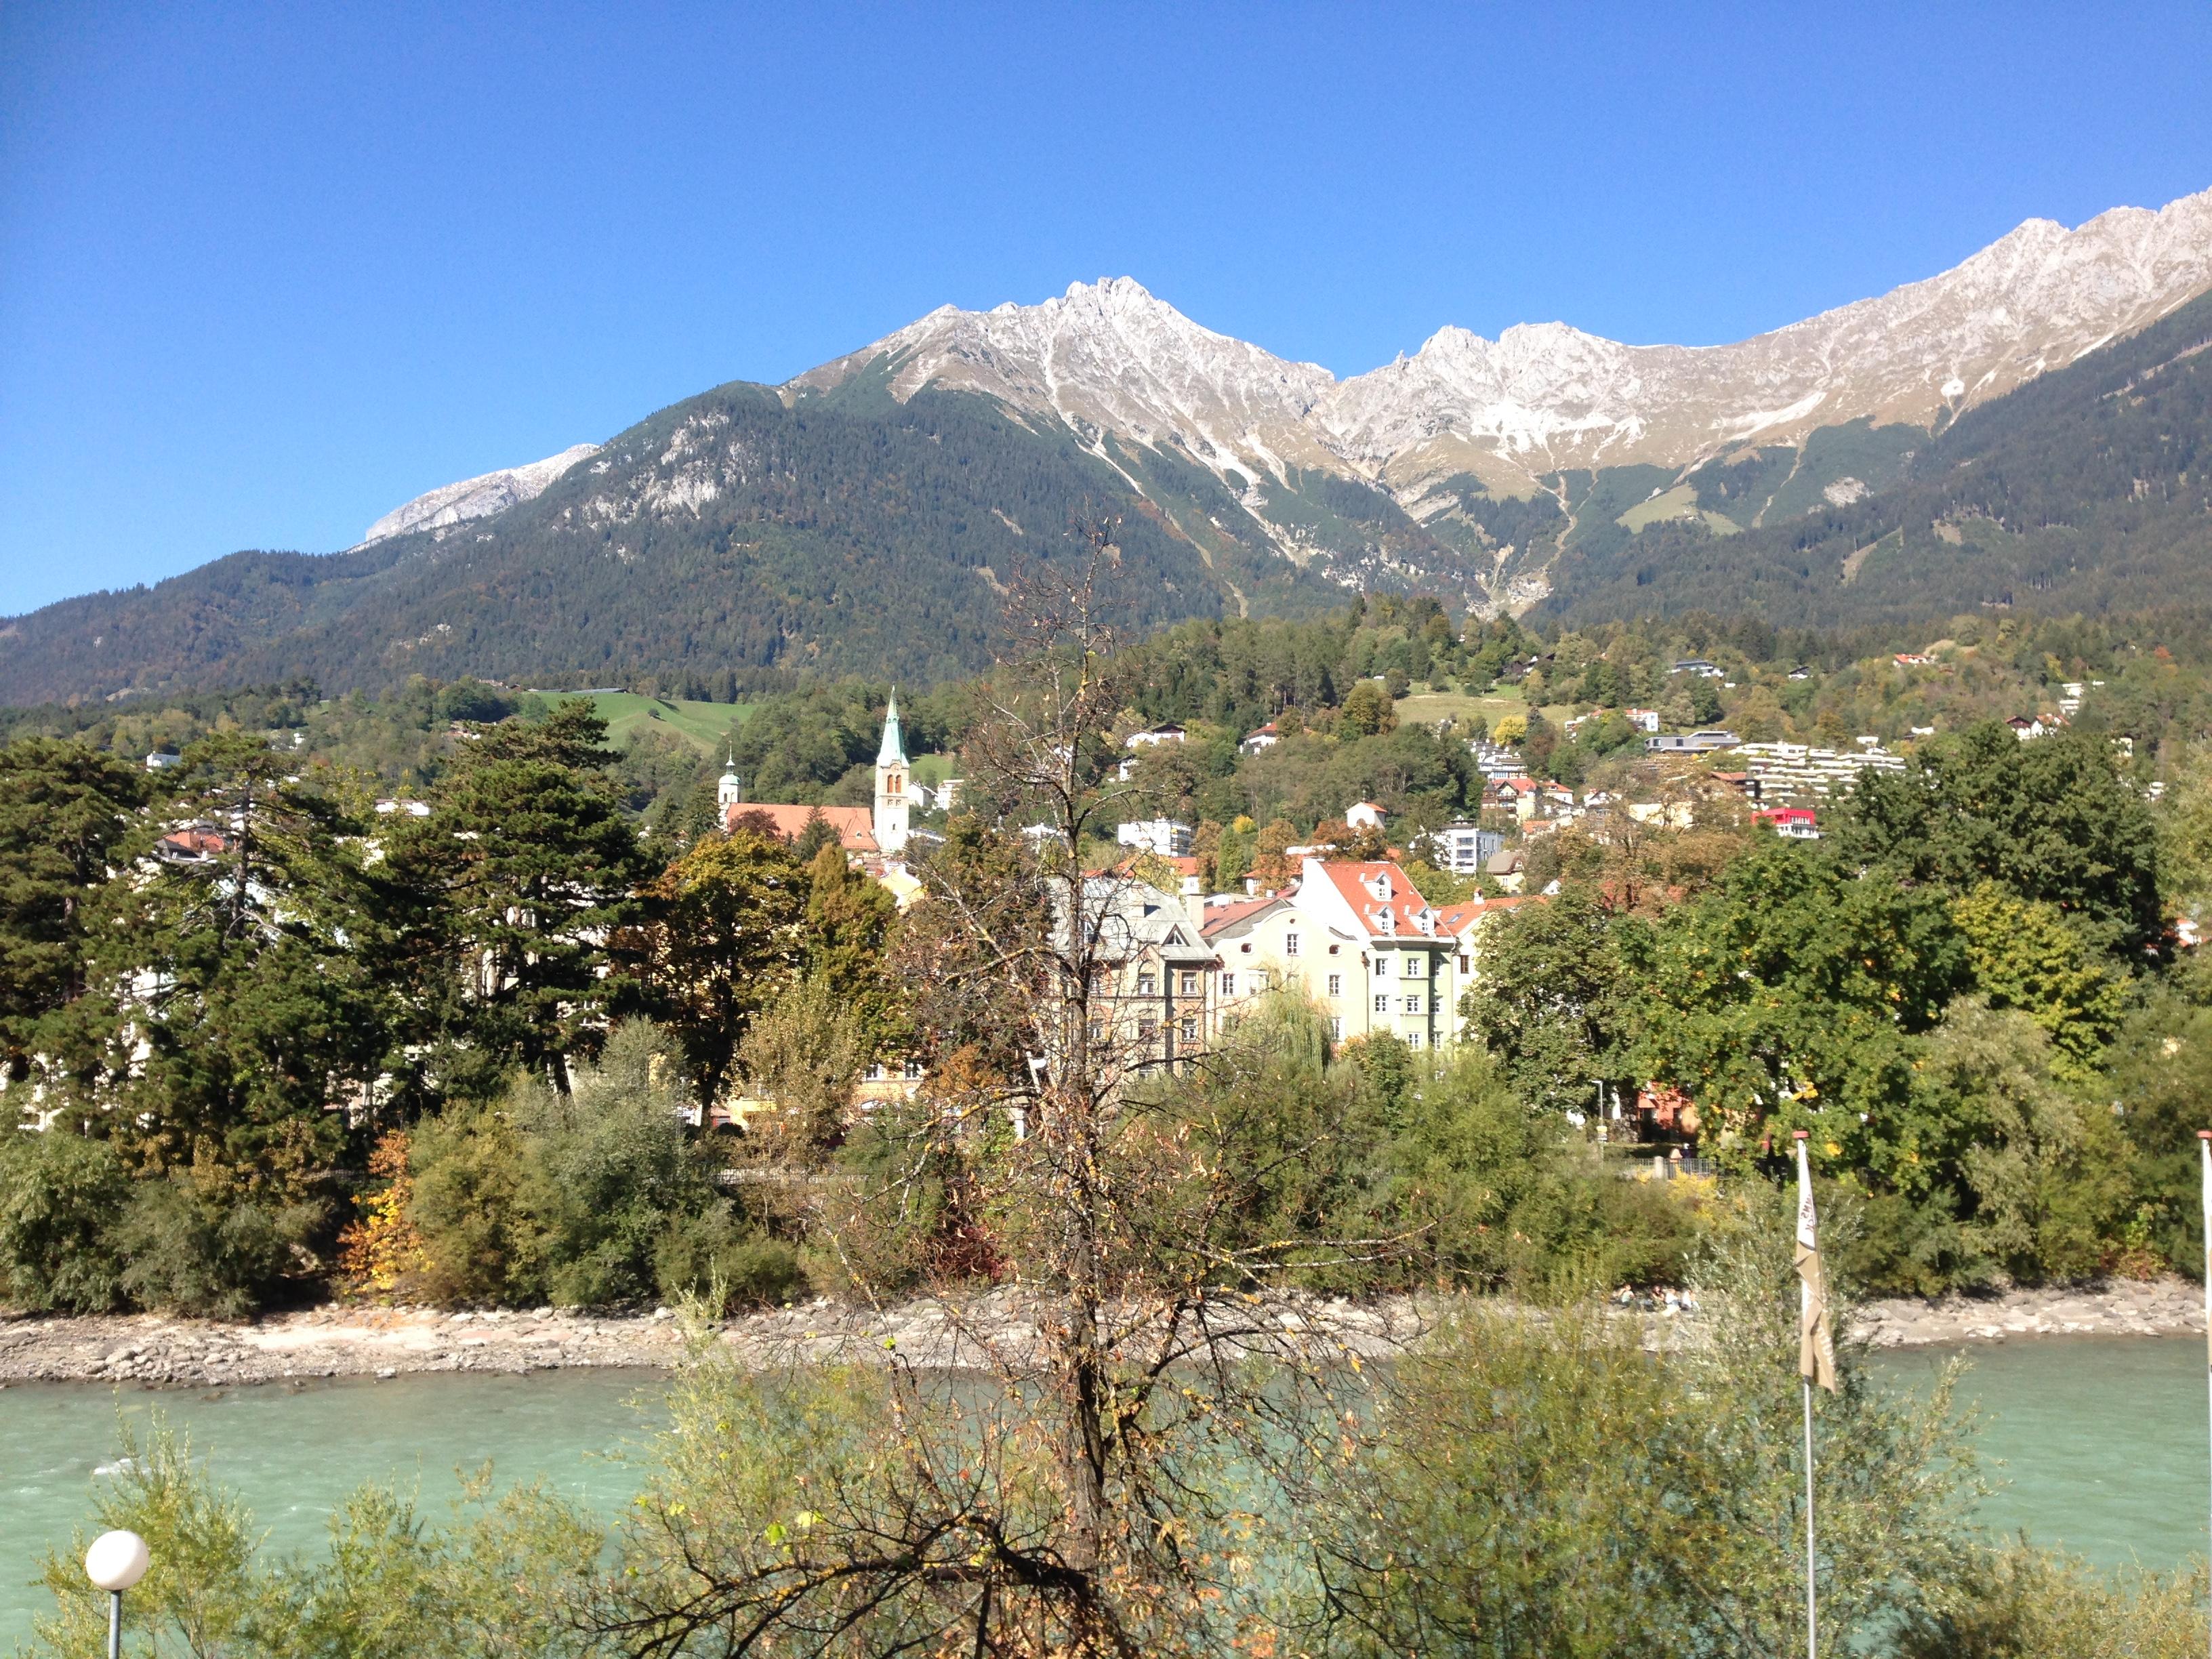 AlpFoodway Midterm Conference,  4 - 5 ottobre 2018 - Innsbruck (A)